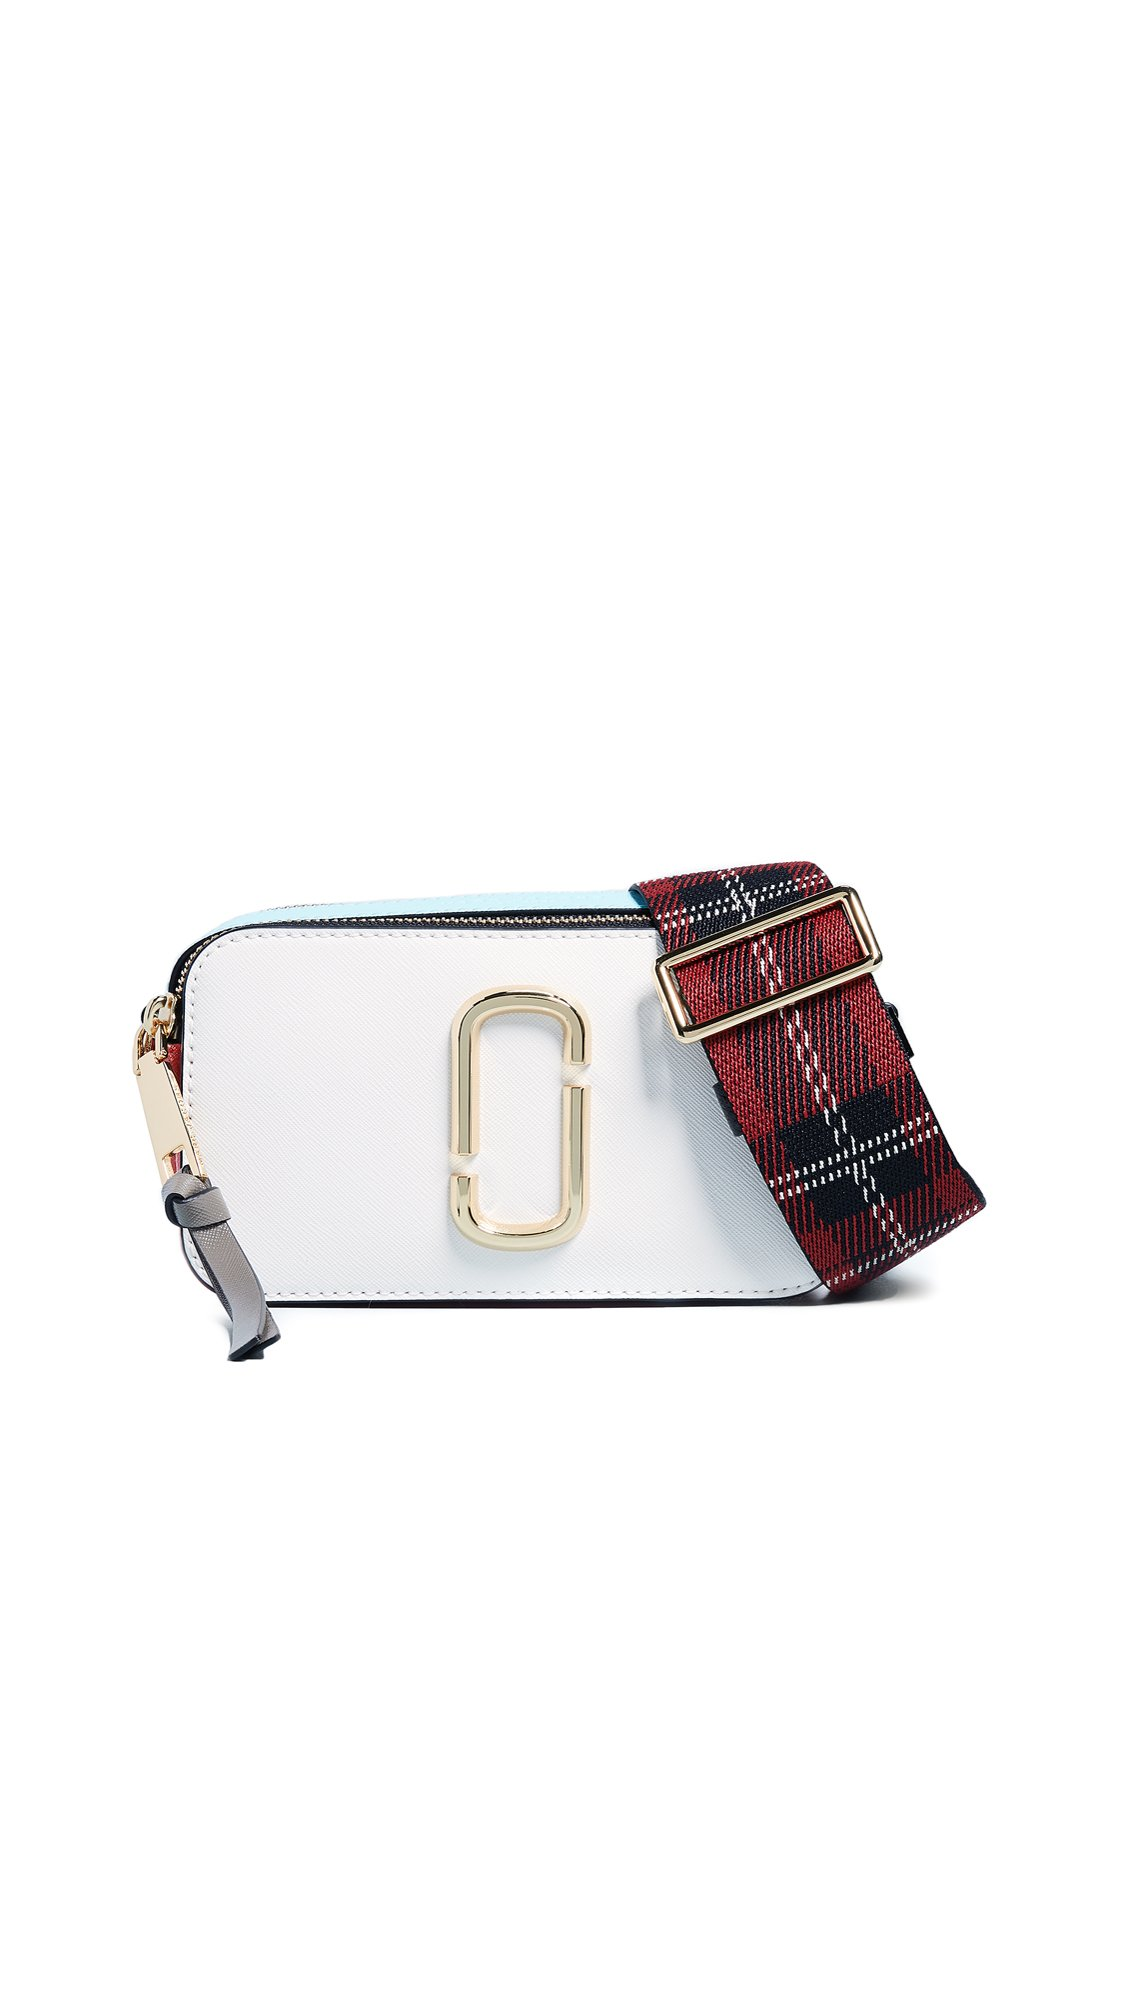 Marc Jacobs Women's Snapshot Camera Bag, Porcelain, White, One Size